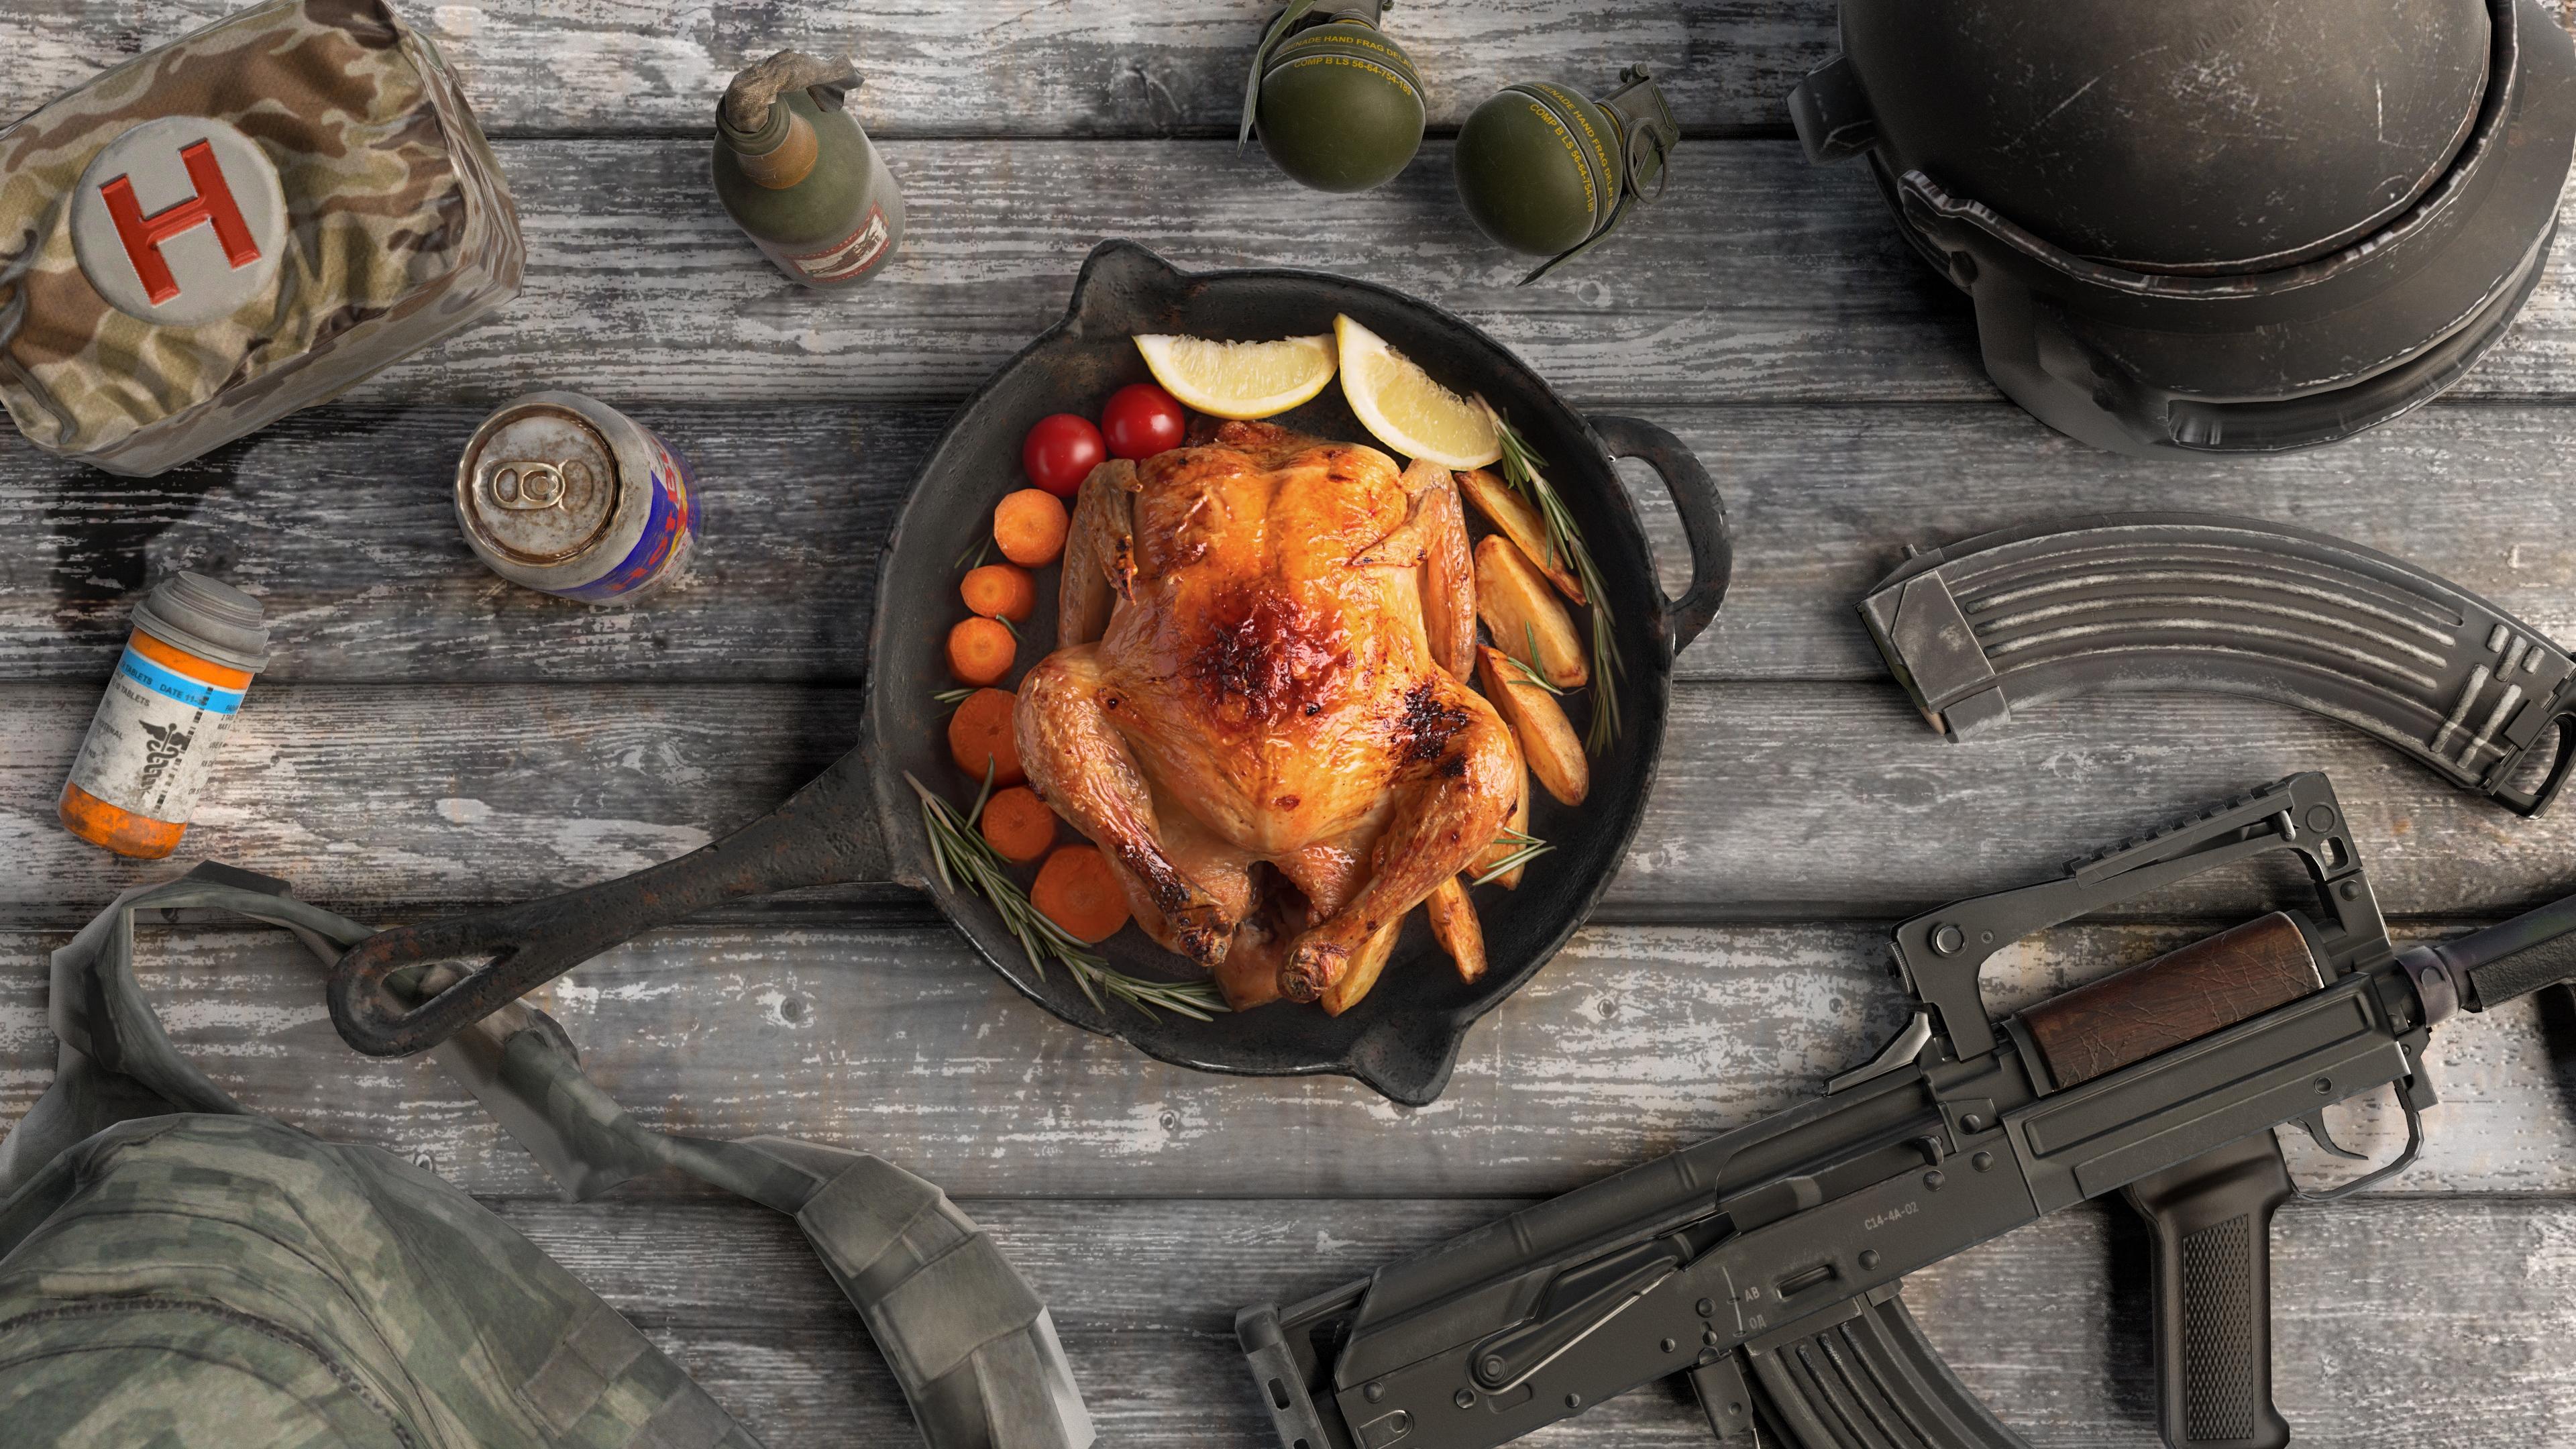 ảnh nền pubg chicken dinner 4k